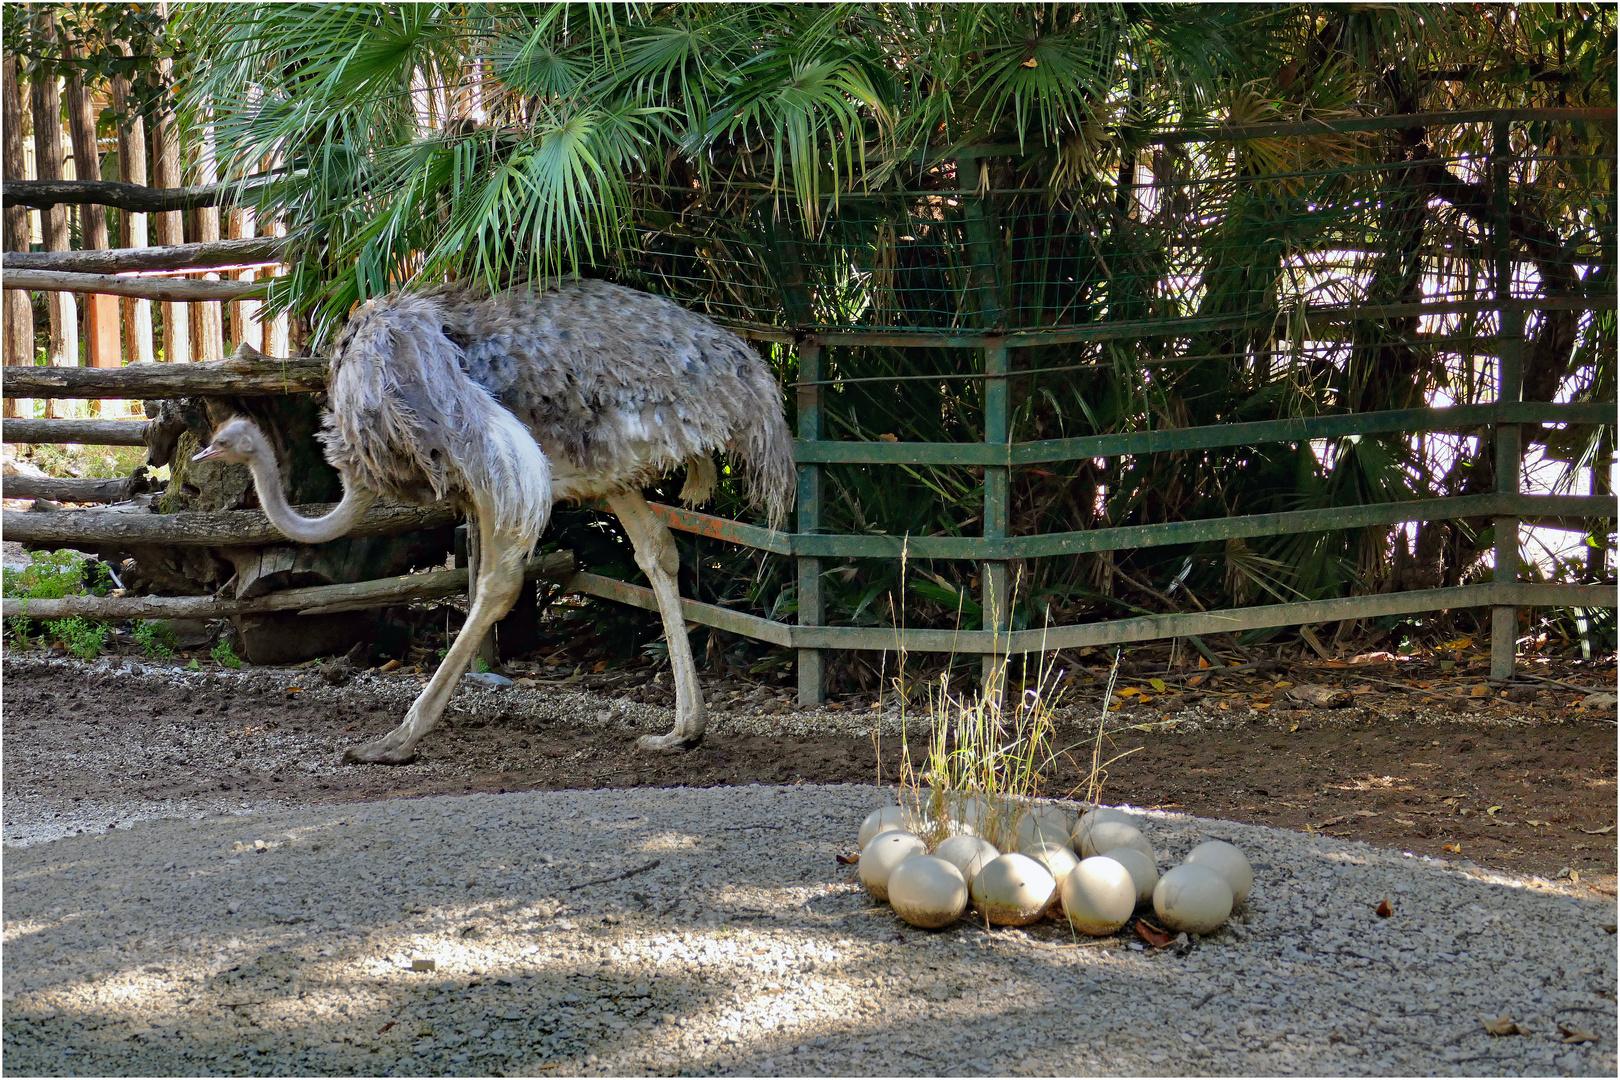 au zoo de pistoia .....